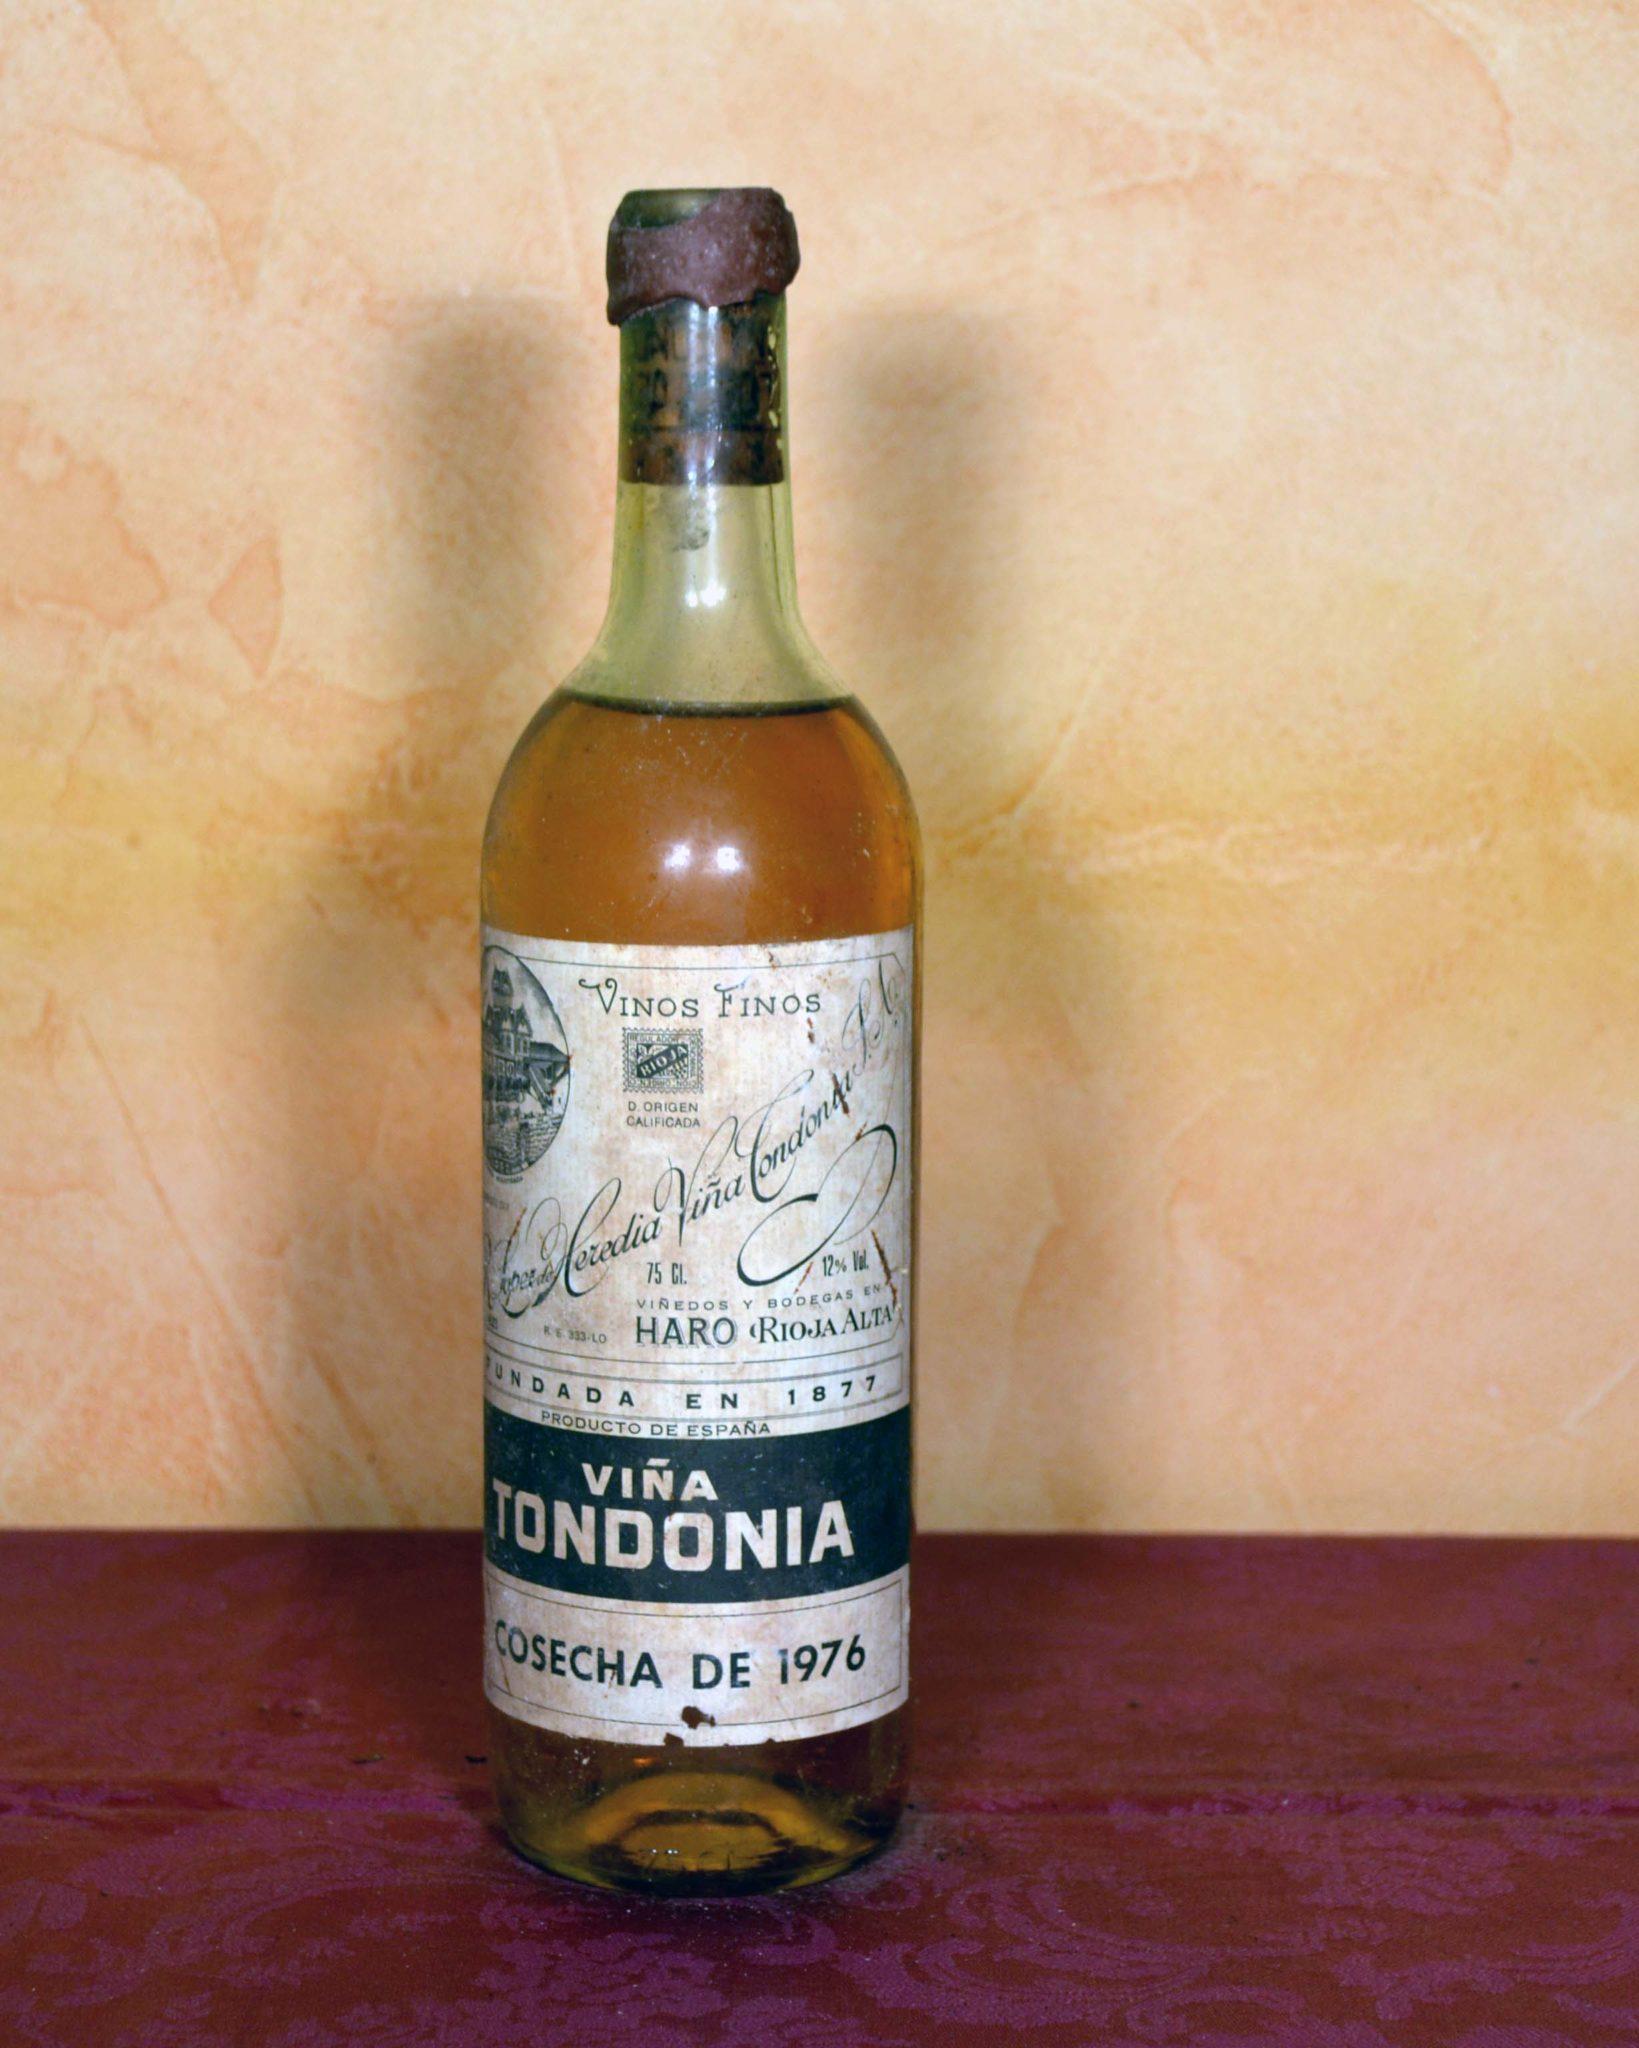 viña tondonia white gran reserva 1976